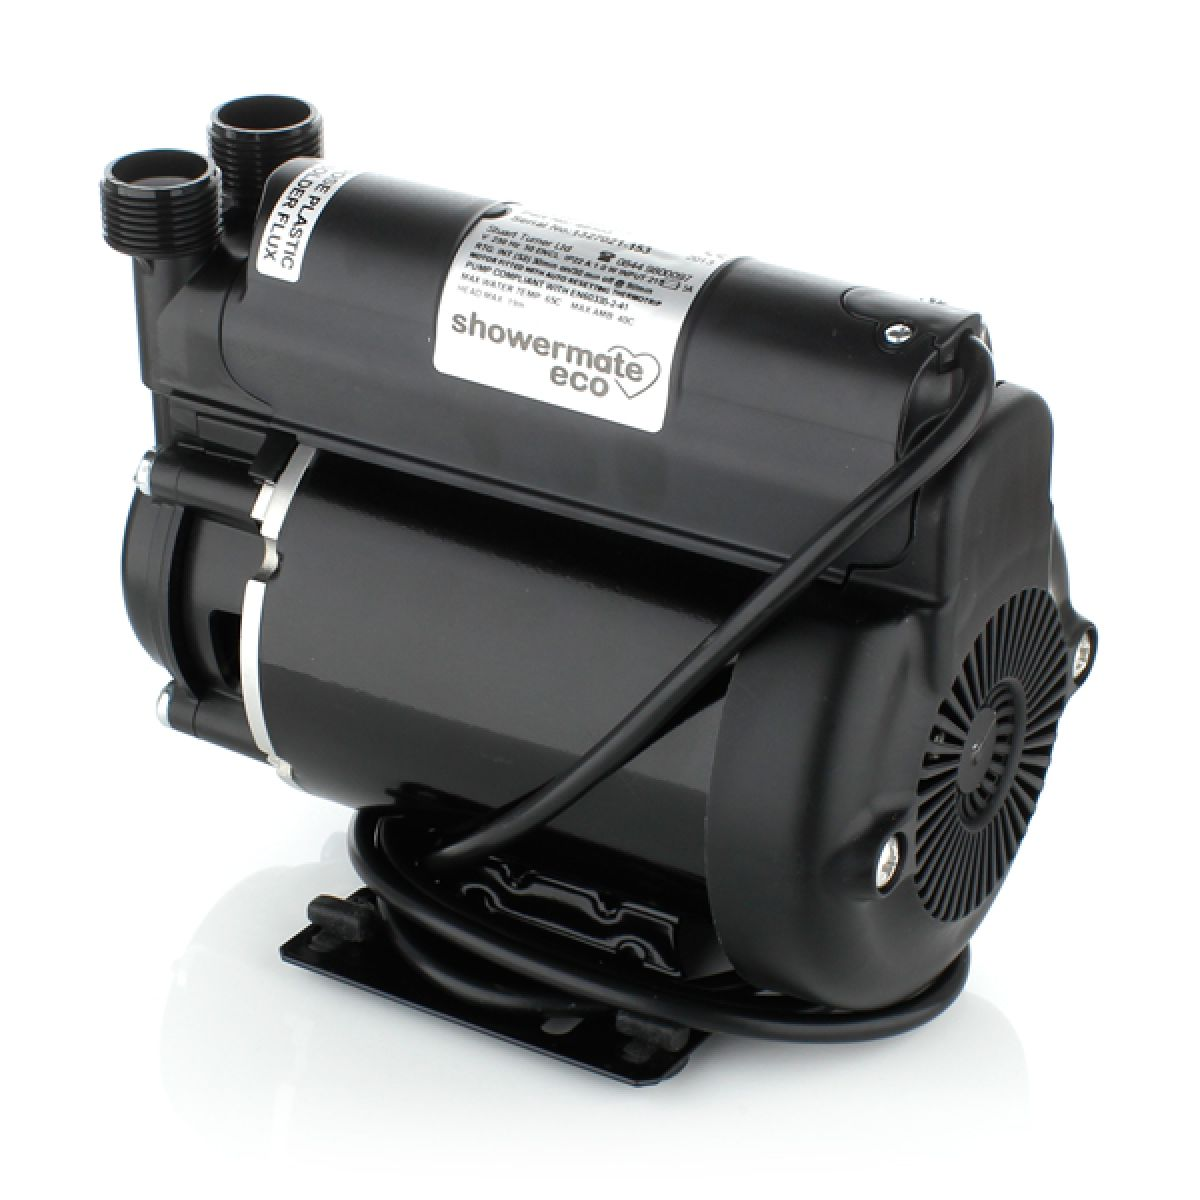 Stuart Turner 46503 Showermate Eco Standard Single 2.0 Bar Pump